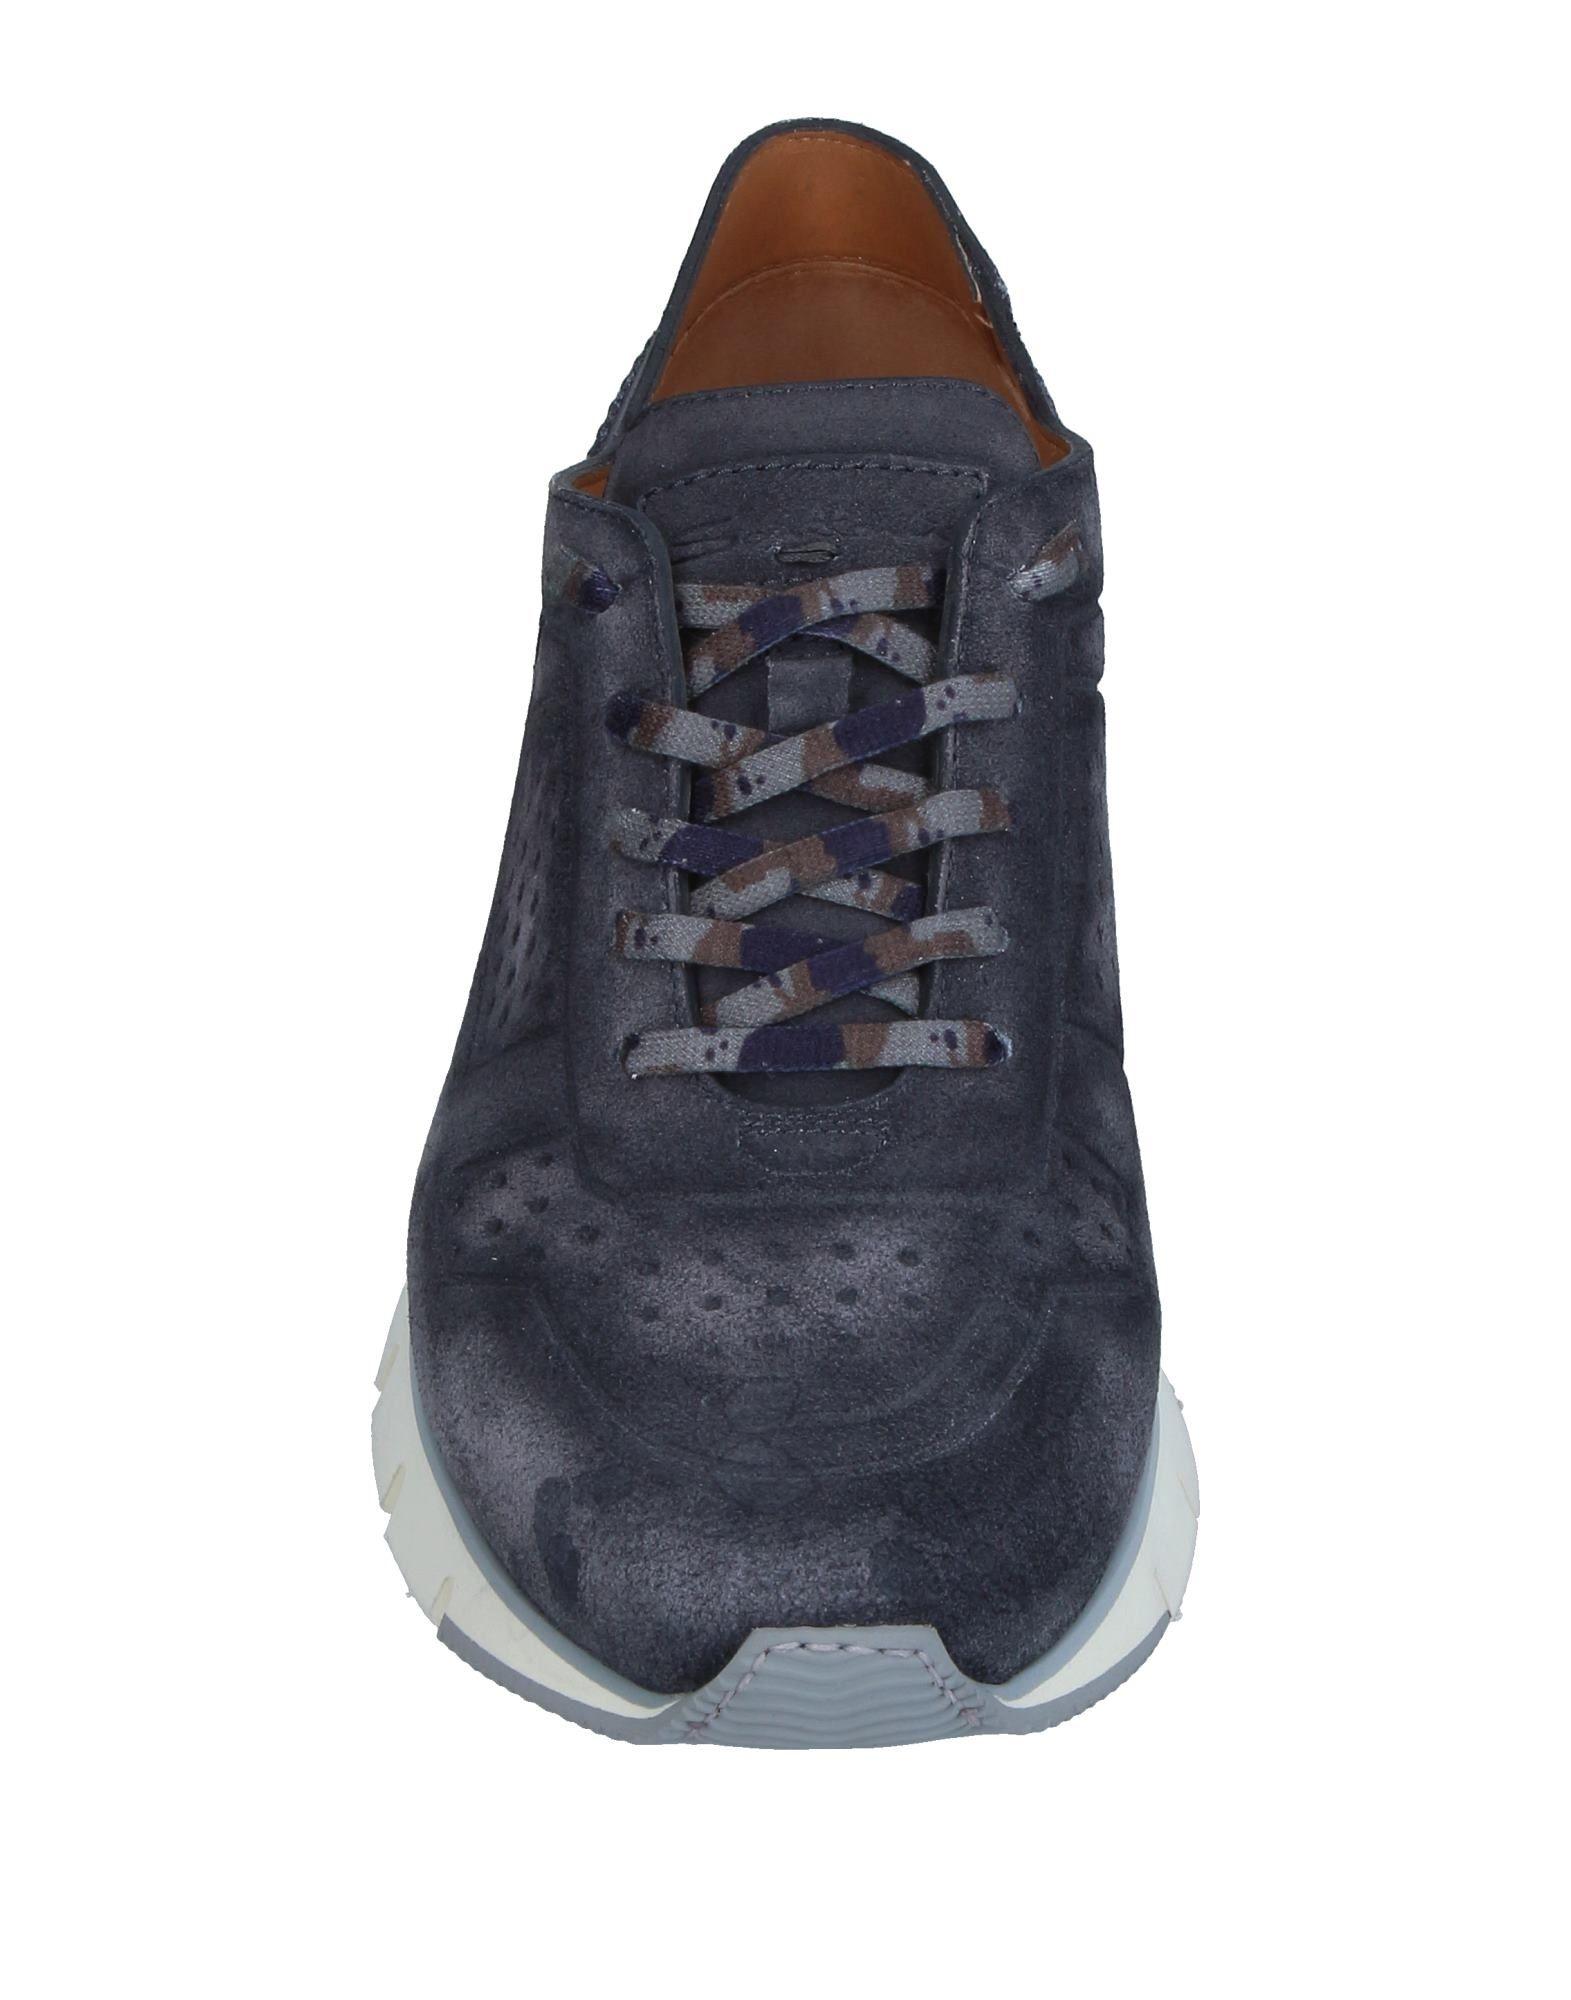 Santoni Gute Sneakers Herren  11286618FL Gute Santoni Qualität beliebte Schuhe ebac73